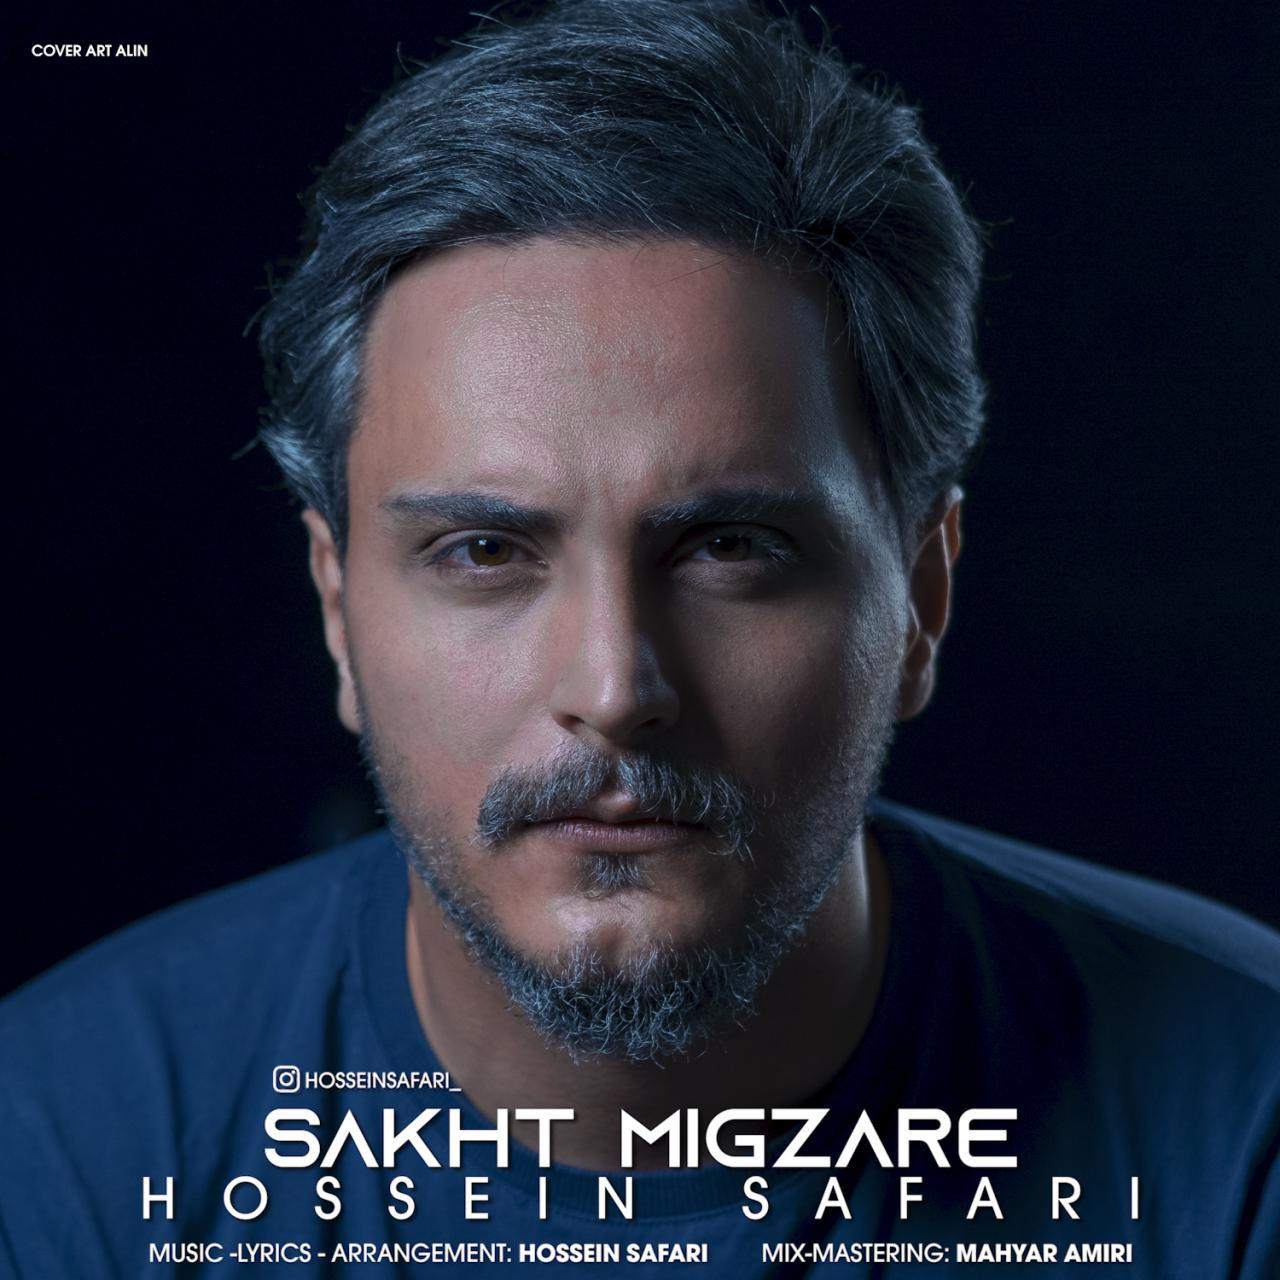 Hossein Safari – Sakht Migzare